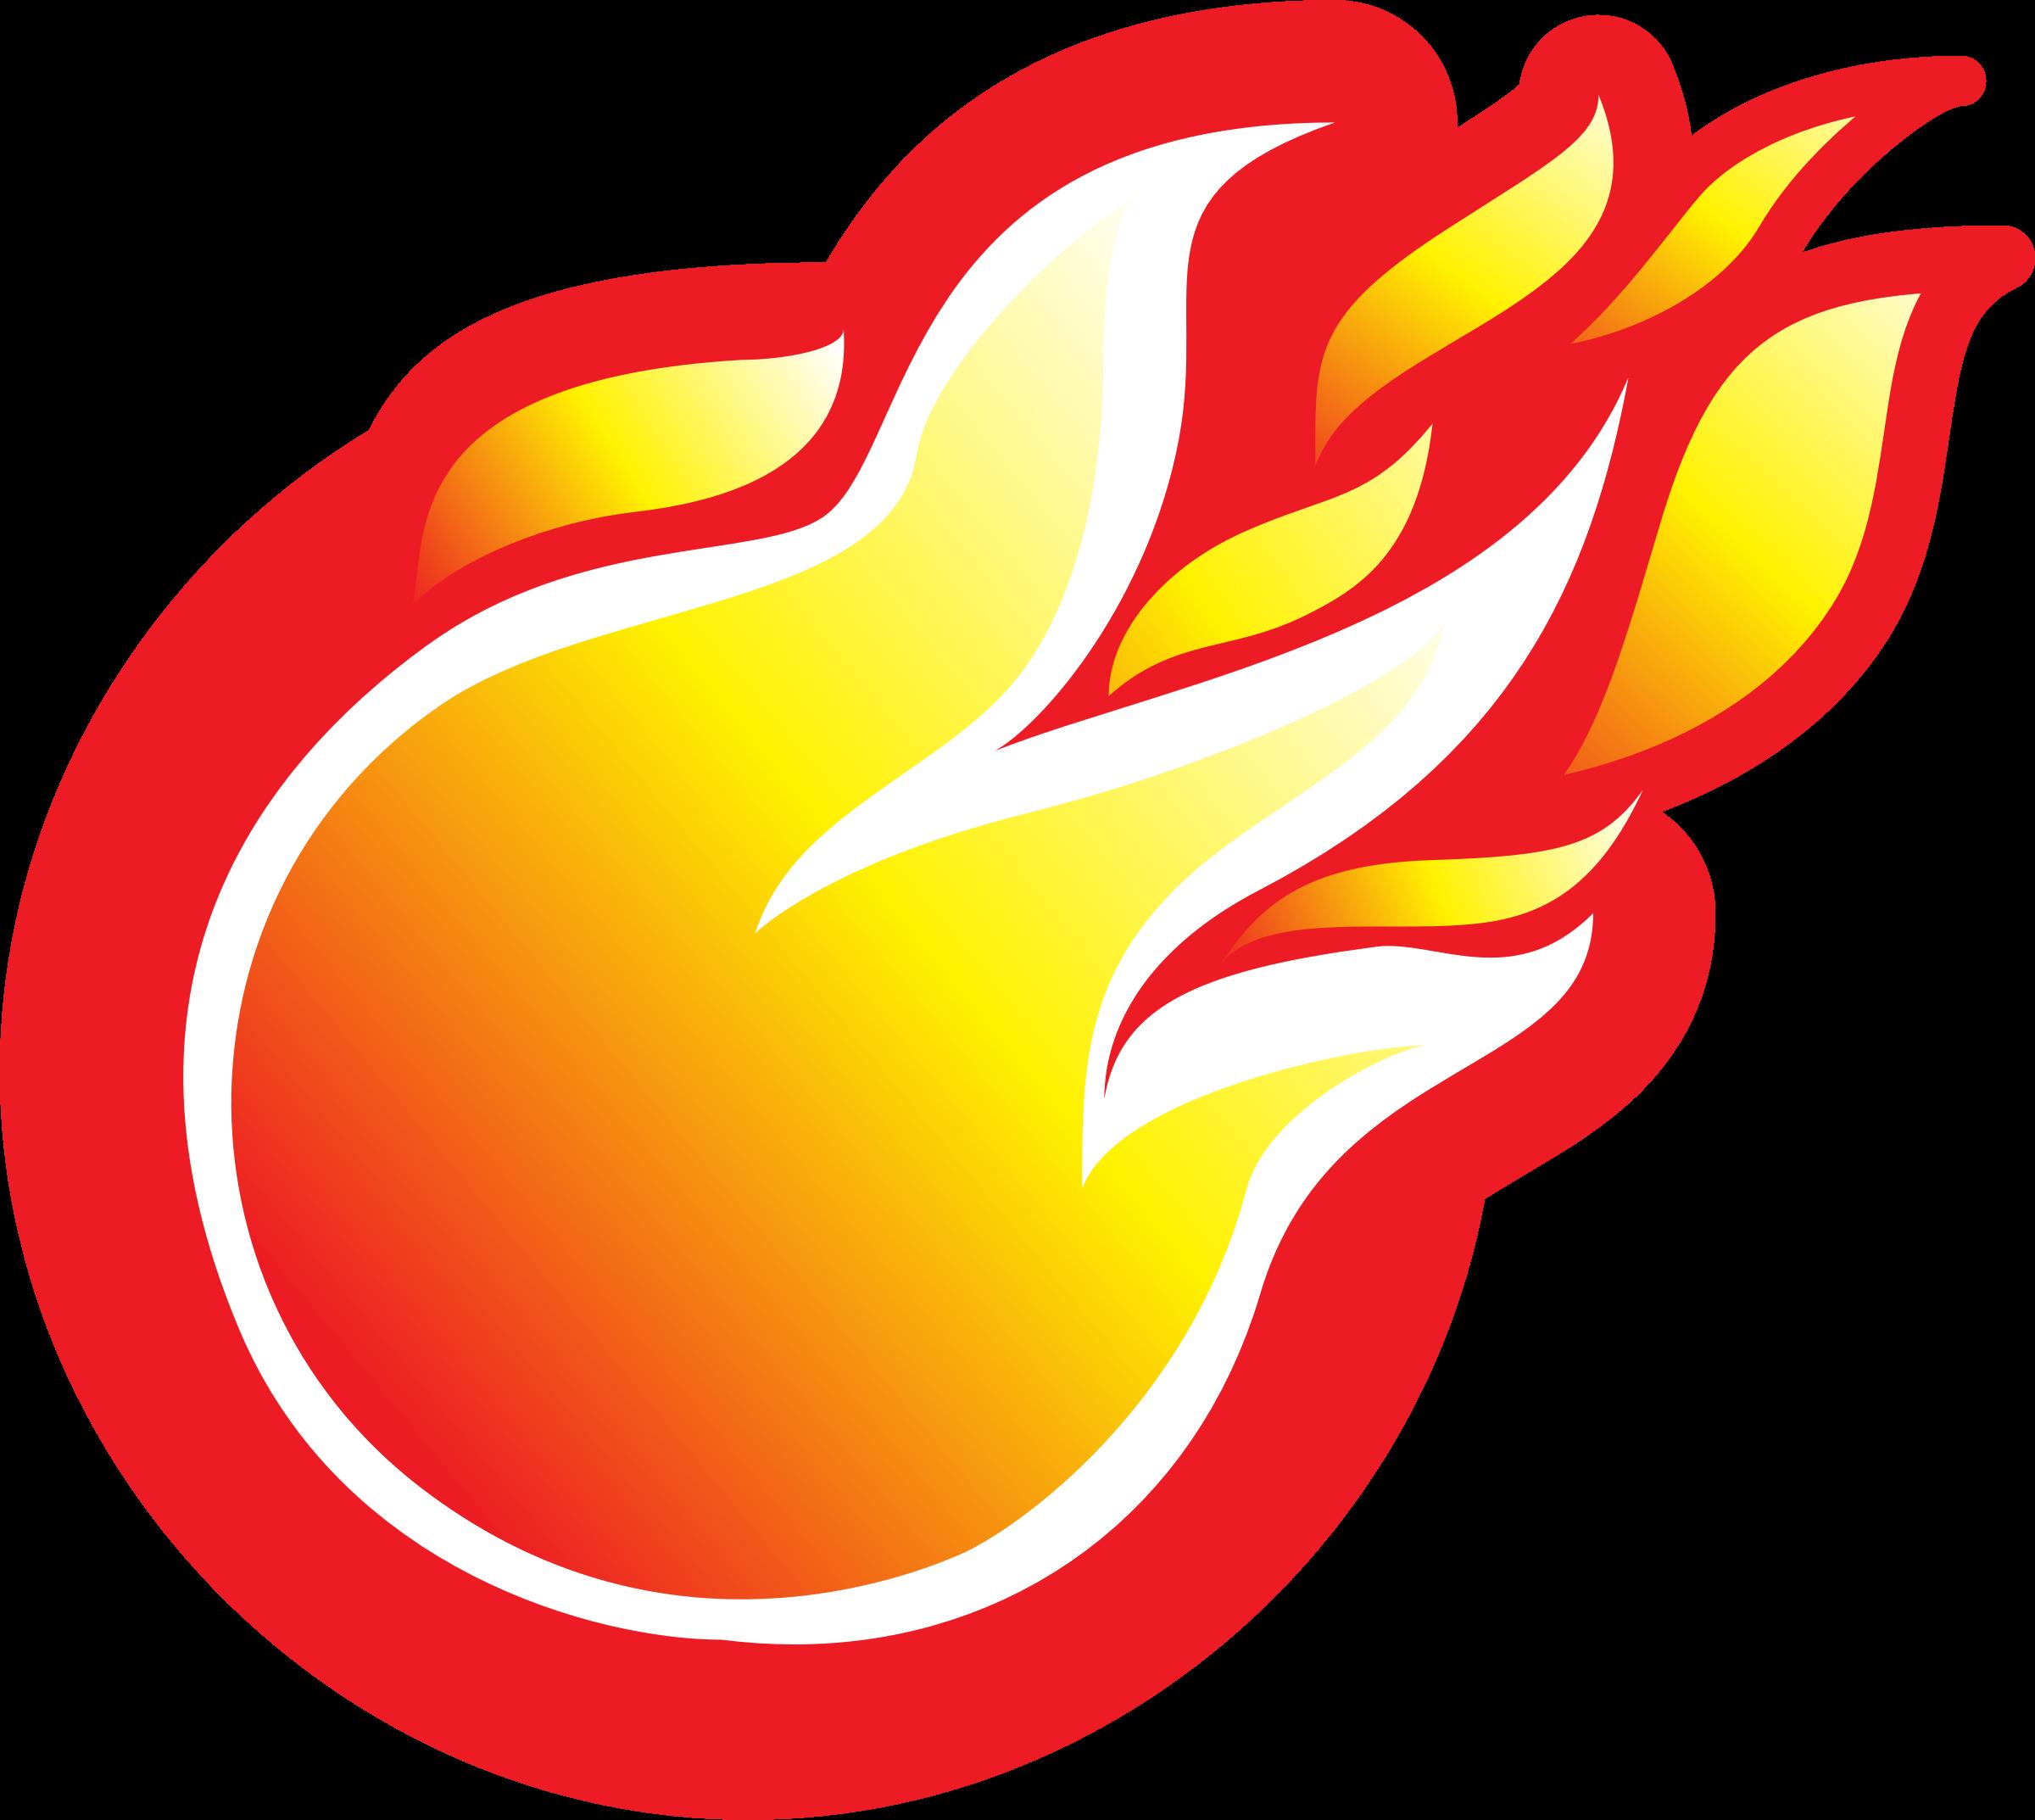 2400x2146 Flames Flame Clip Art Vector Graphics Image 4 2